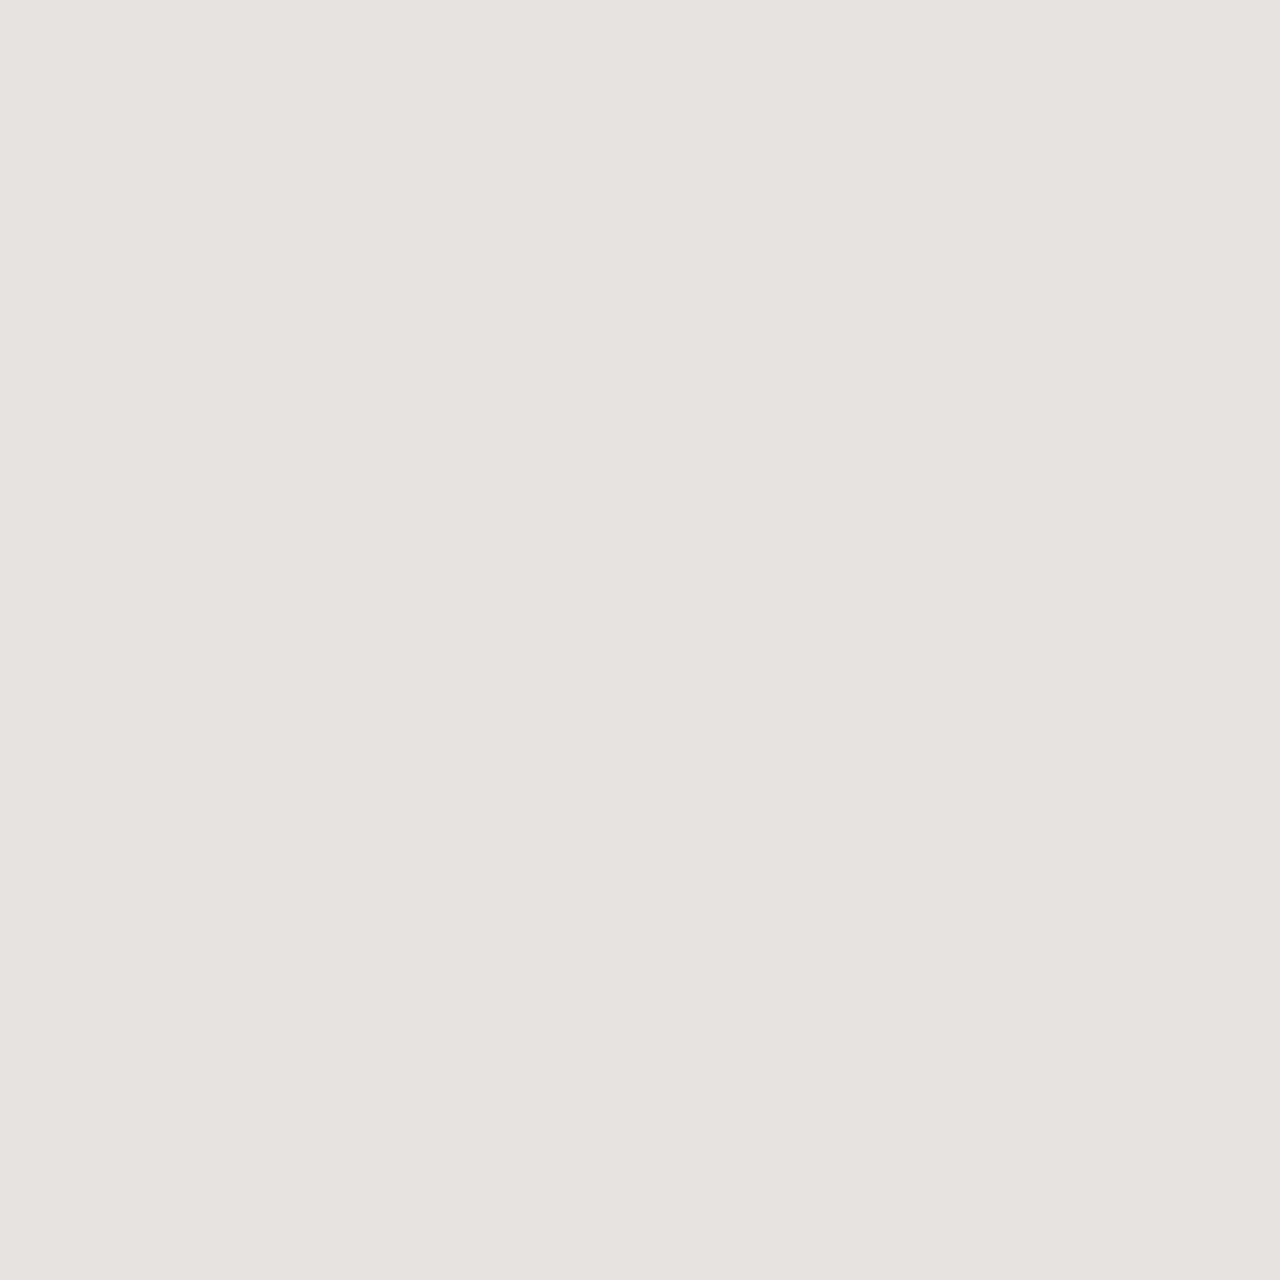 "SUPERIOR SEAMLESS PAPER BACKGROUND 53""X36' - DAWN GREY"